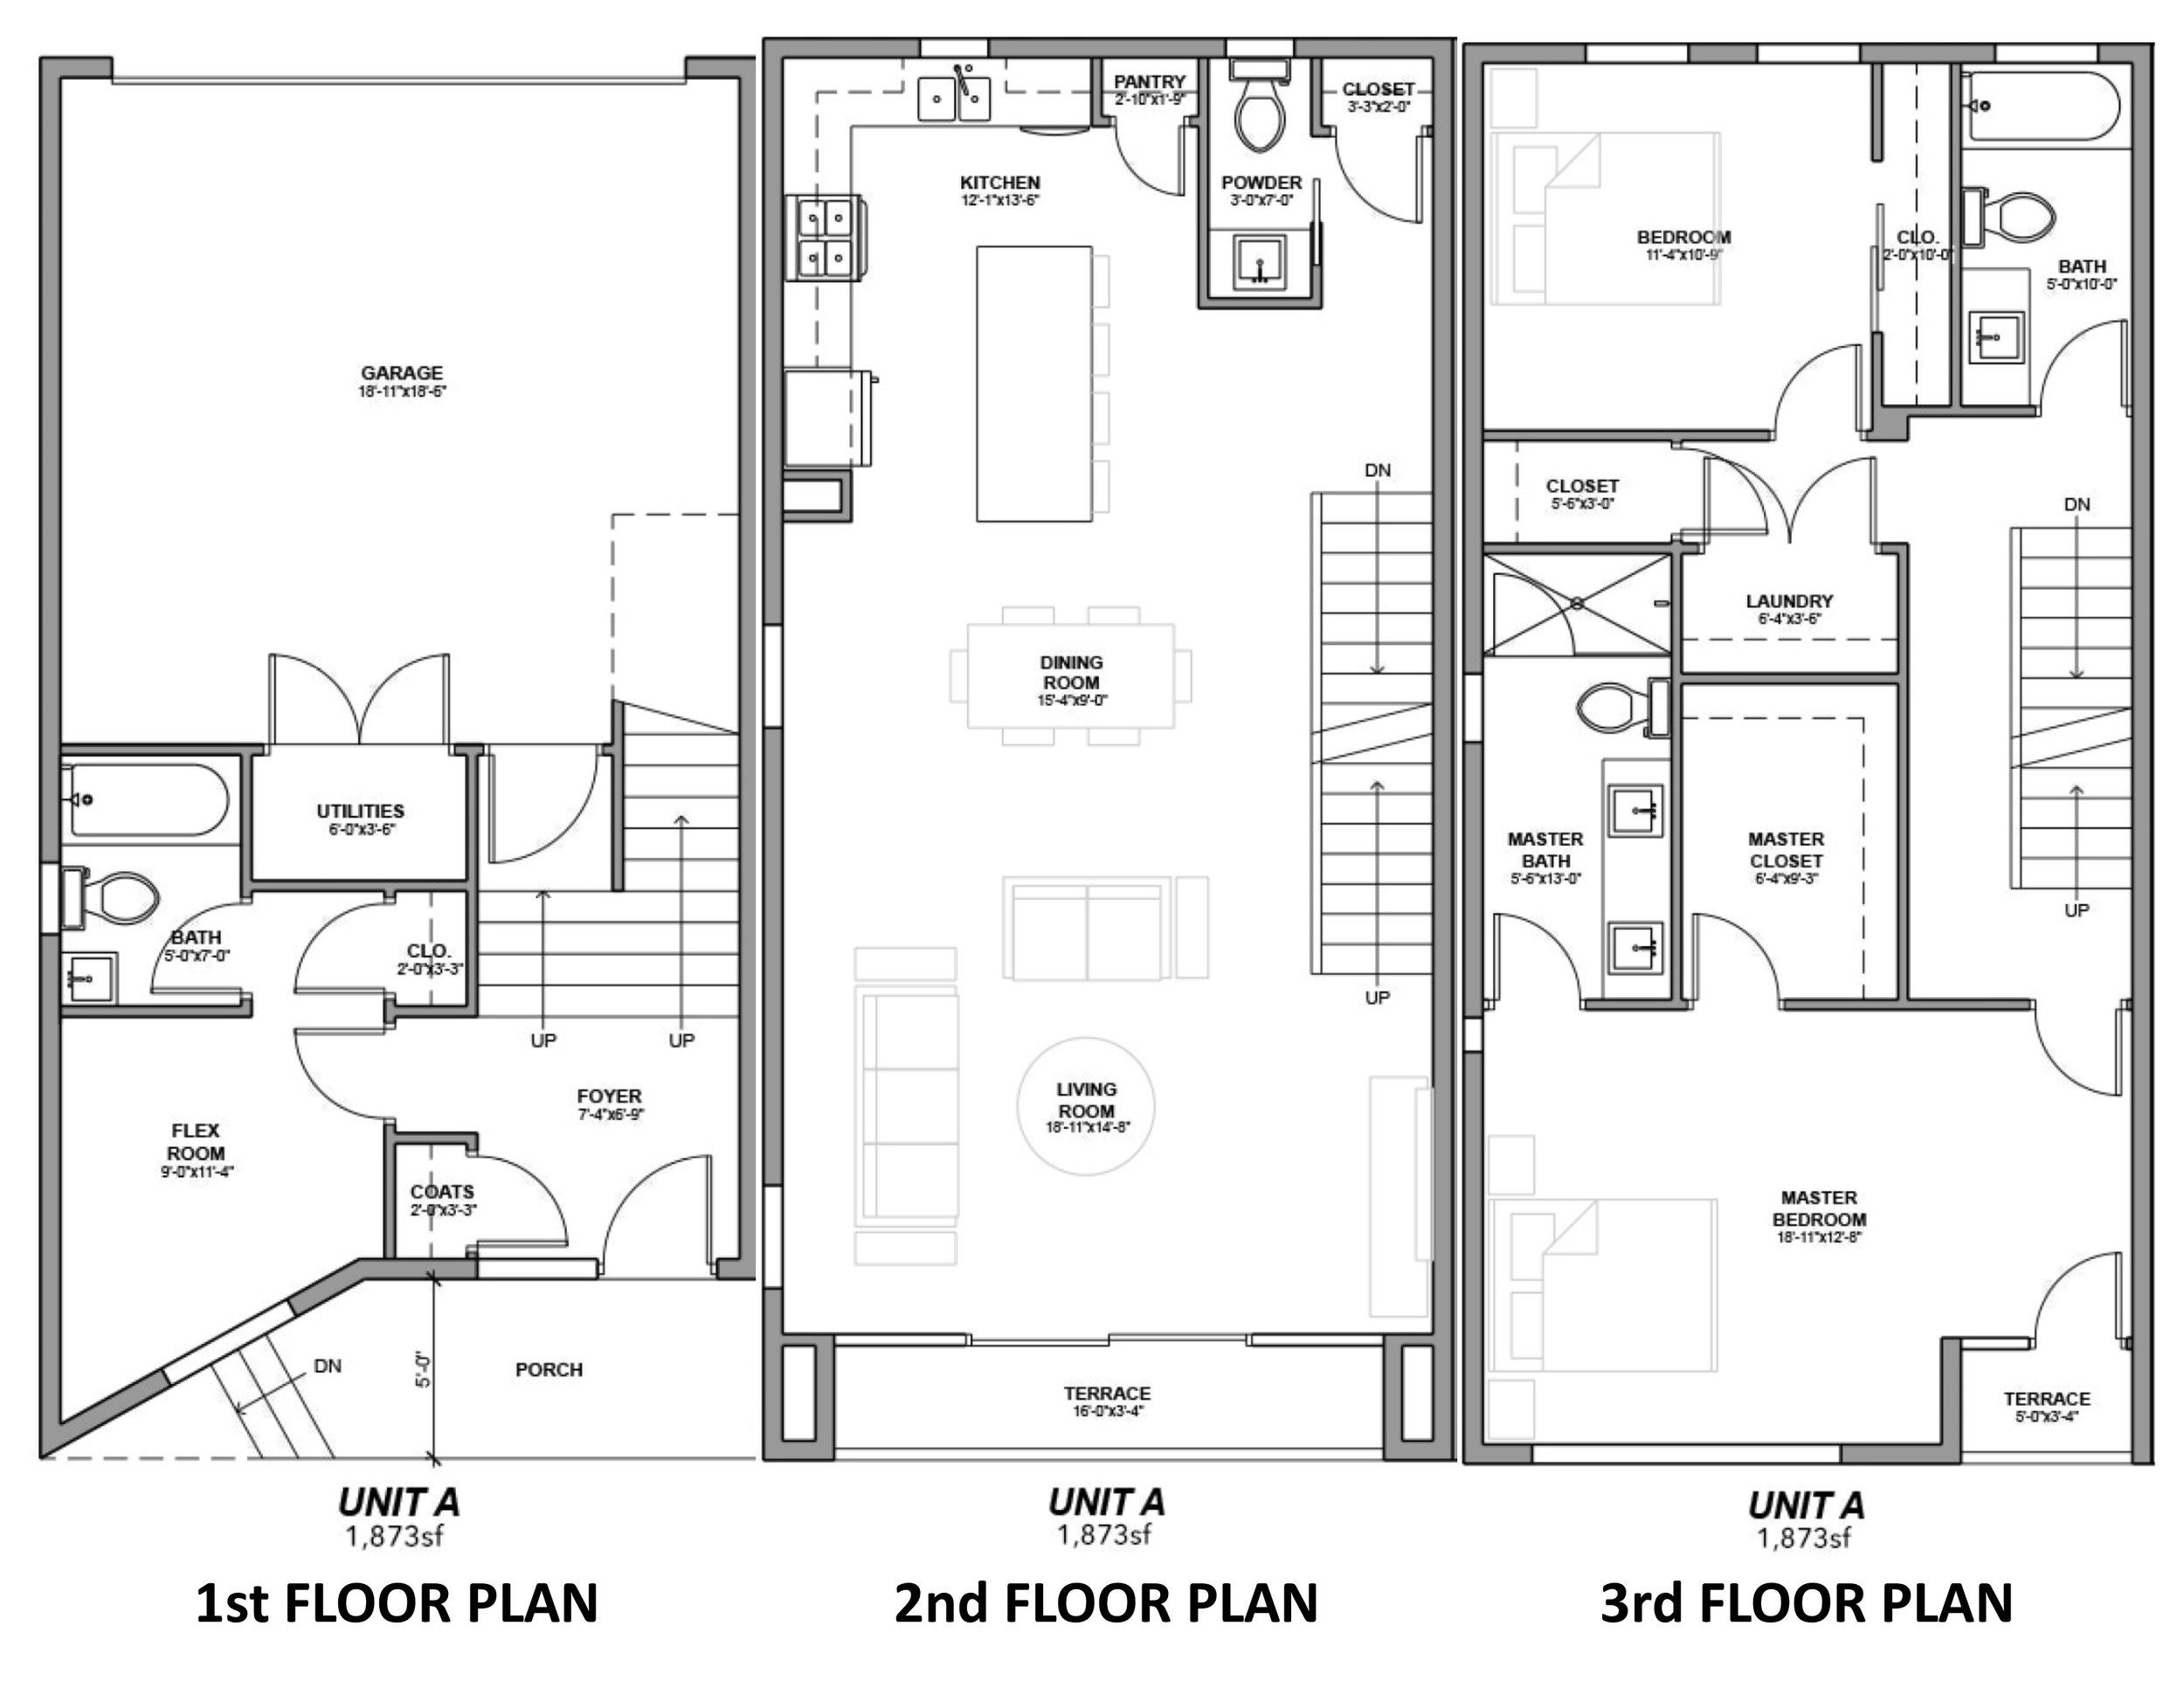 Floorplan Building 2 Unit A 412 Jefferson.jpg